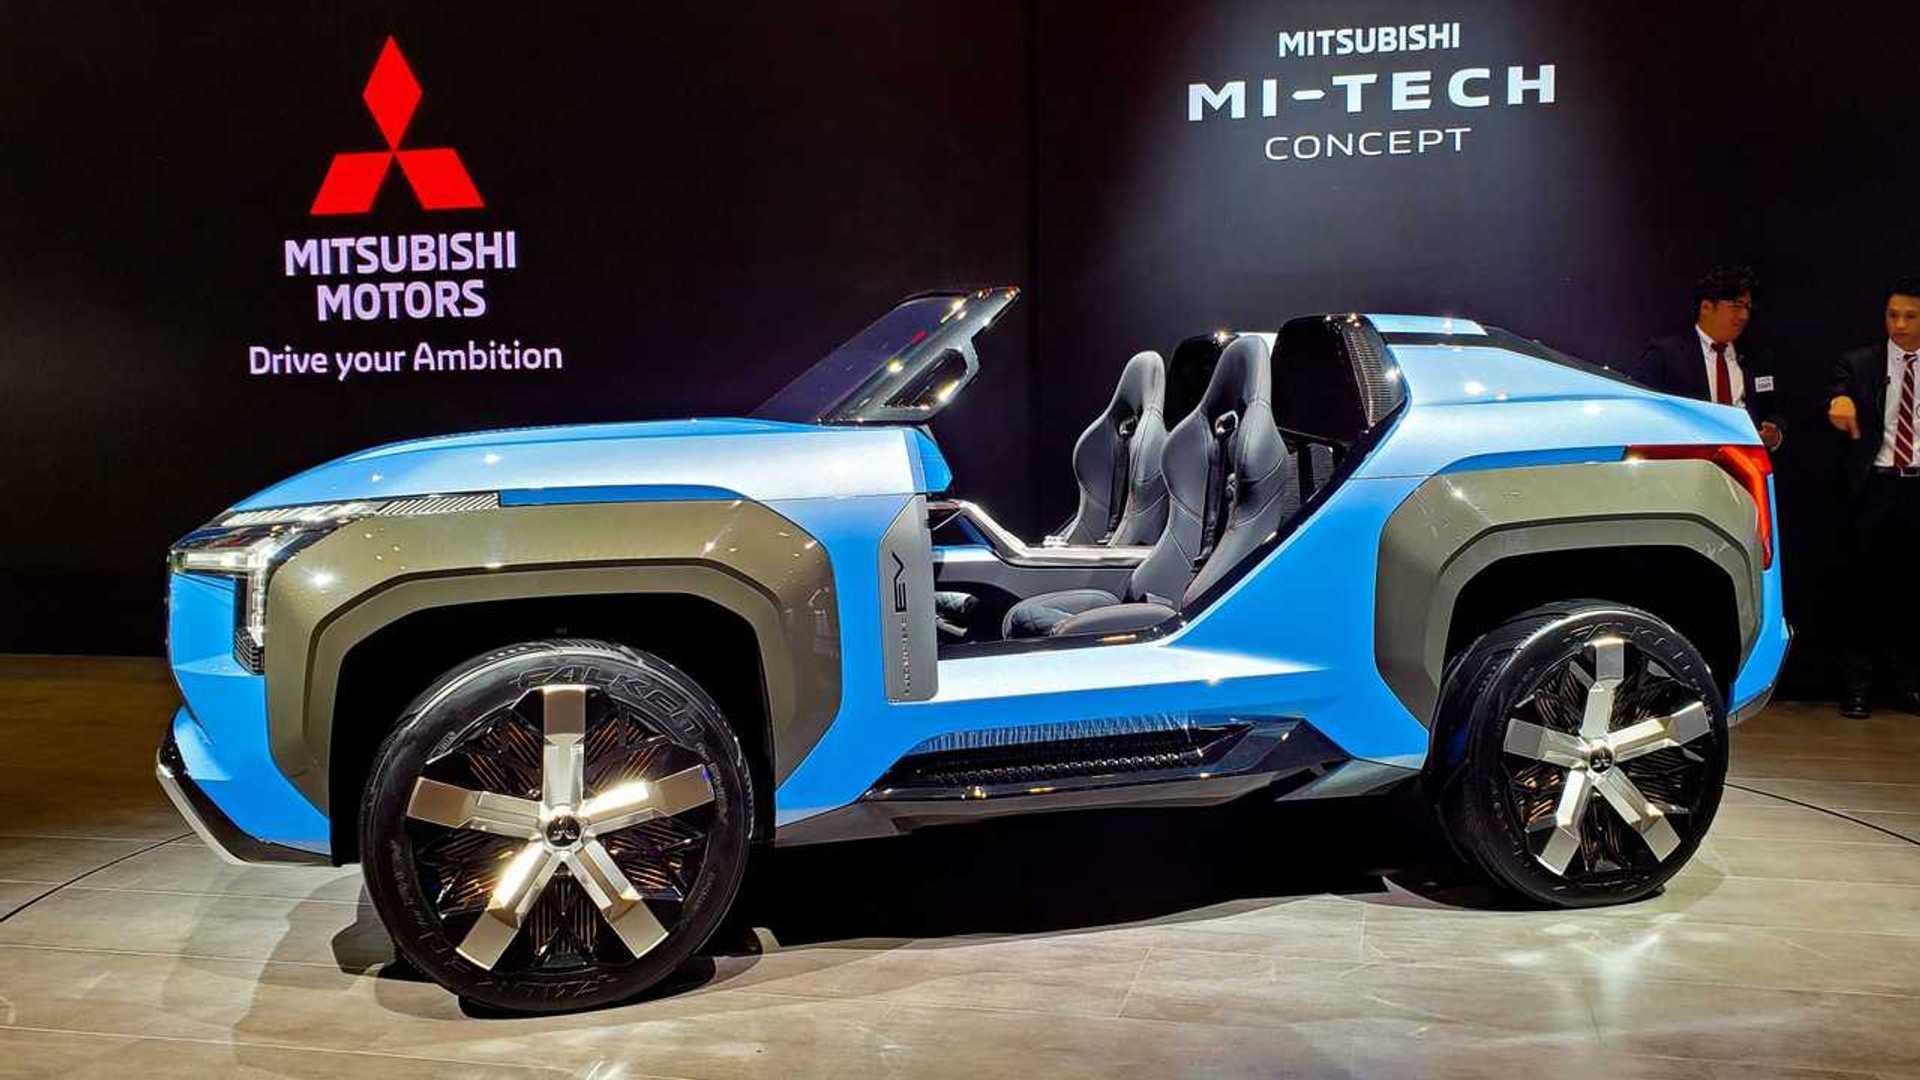 Mitsubishi Mi-Tech debuts as open-top SUV with gas turbine engine